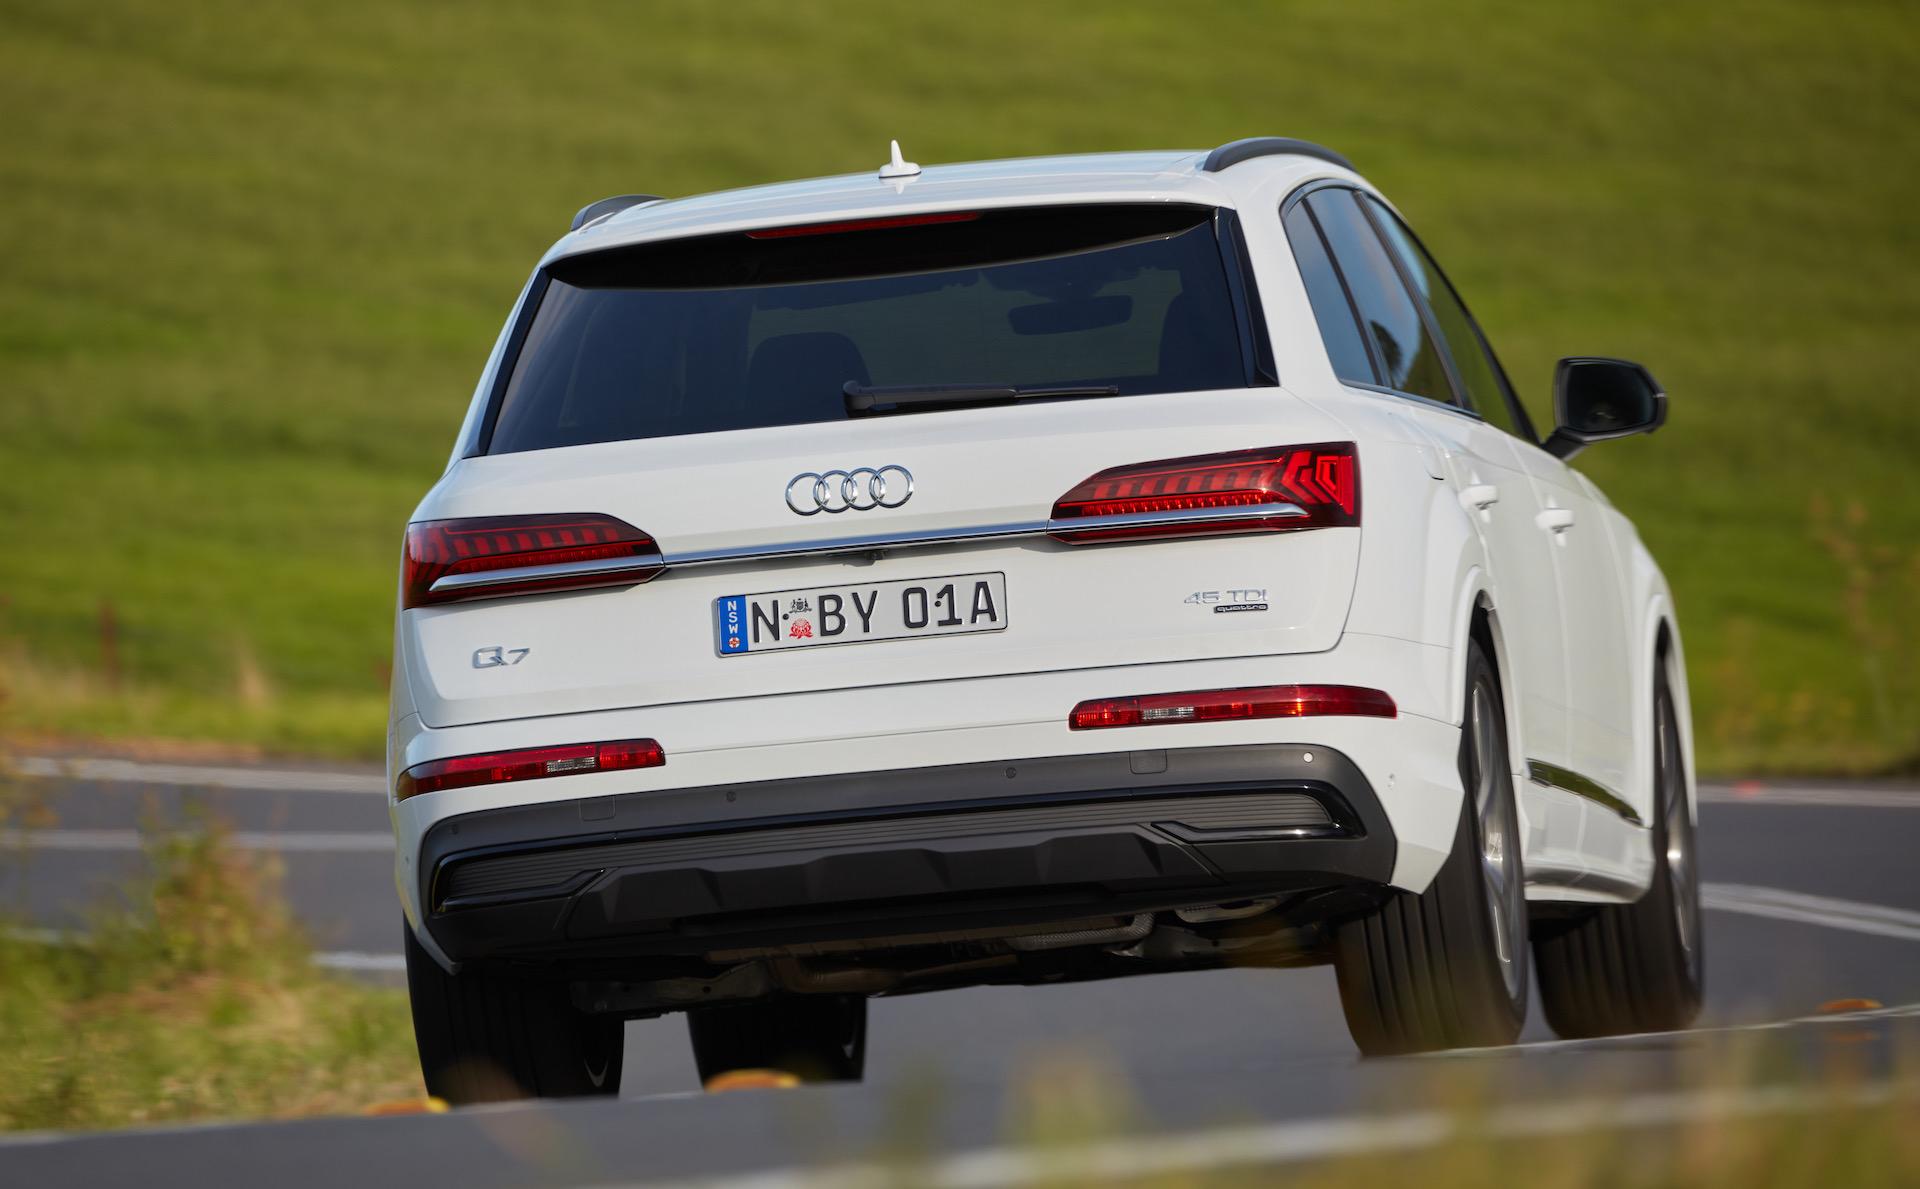 Kelebihan Audi 45 Tdi Review